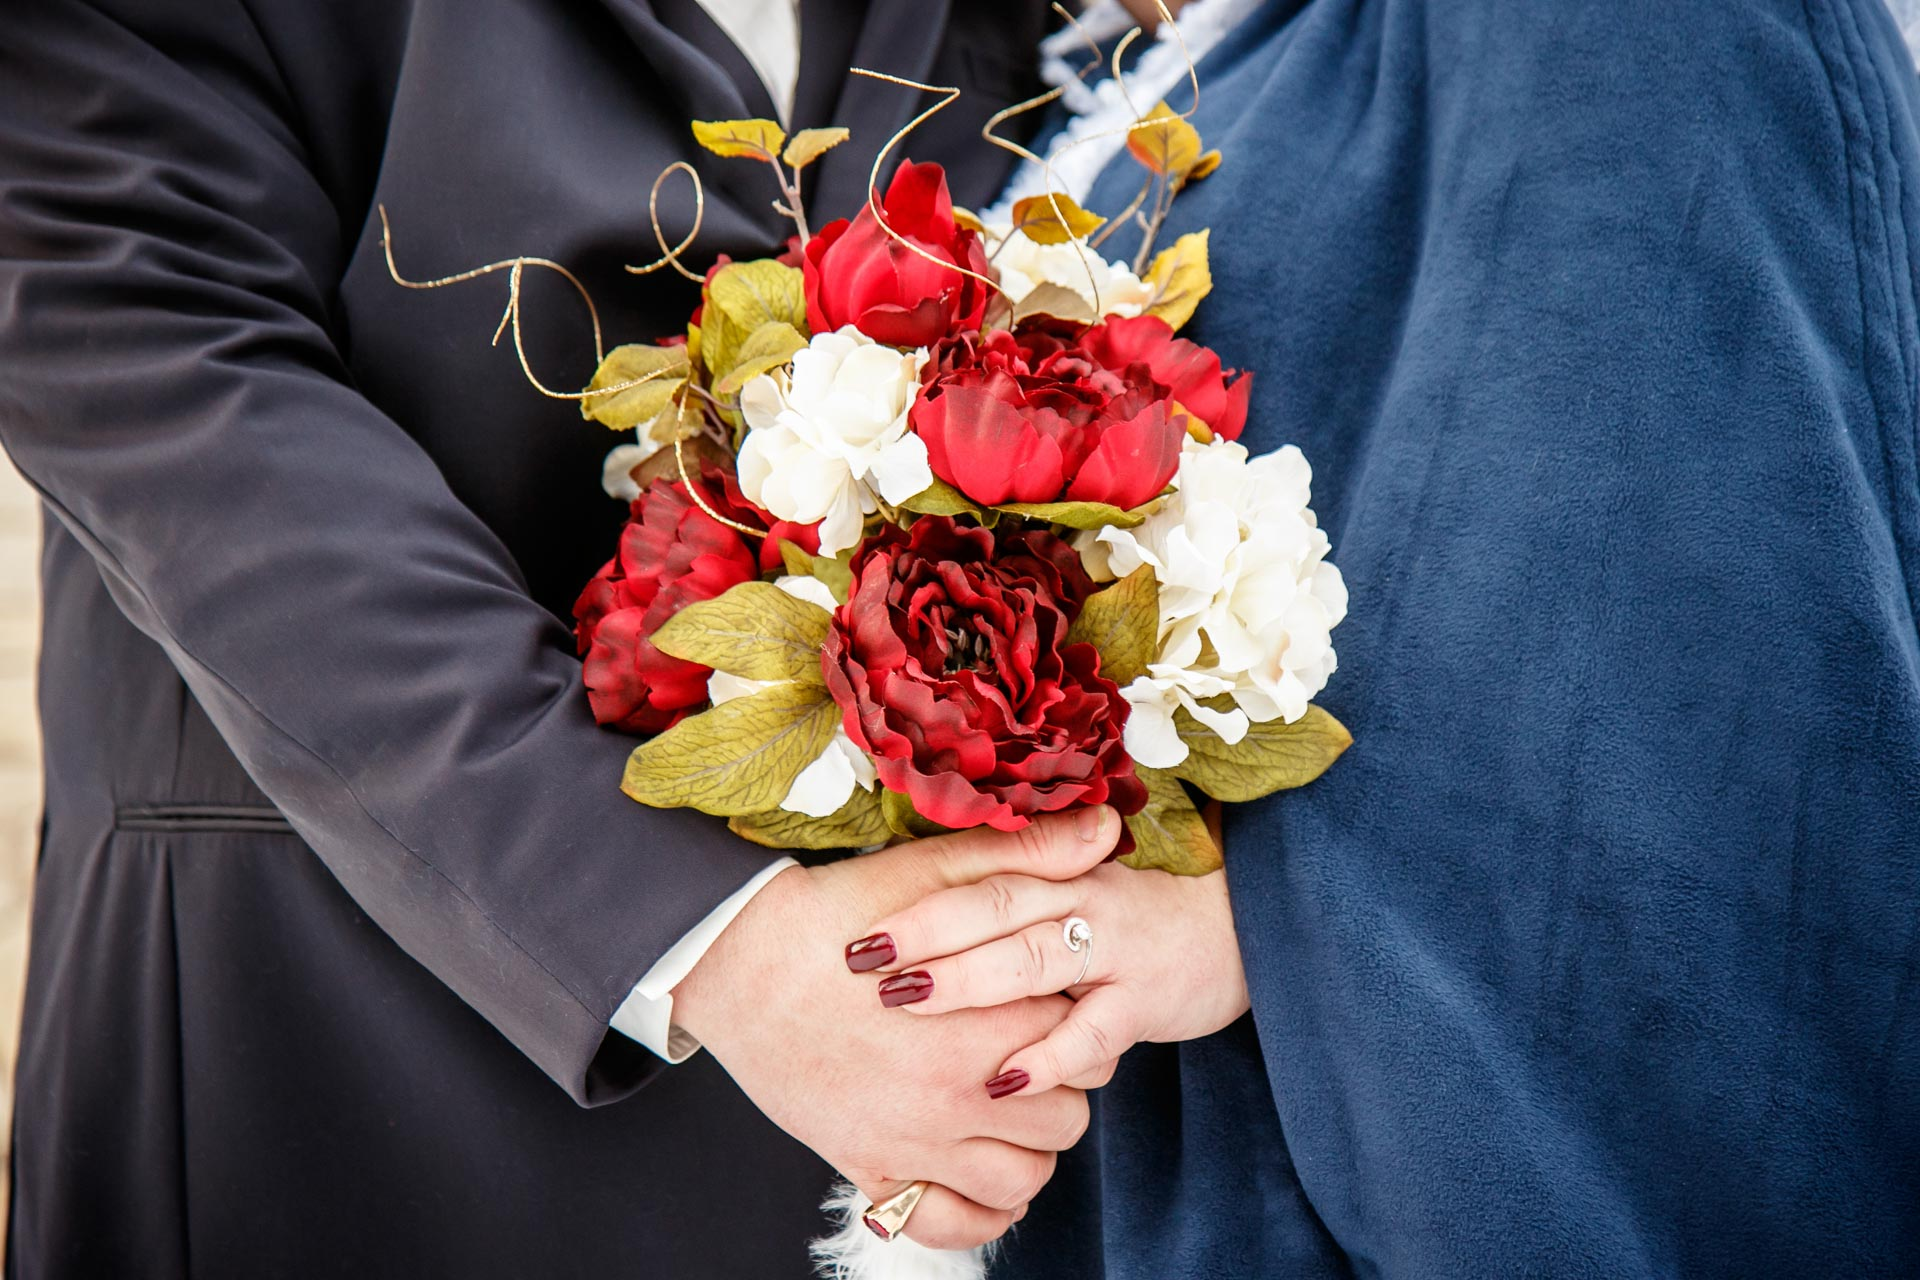 wedding-adam-shea-photography-green-bay-appleton-neenah-photographer-04.jpg